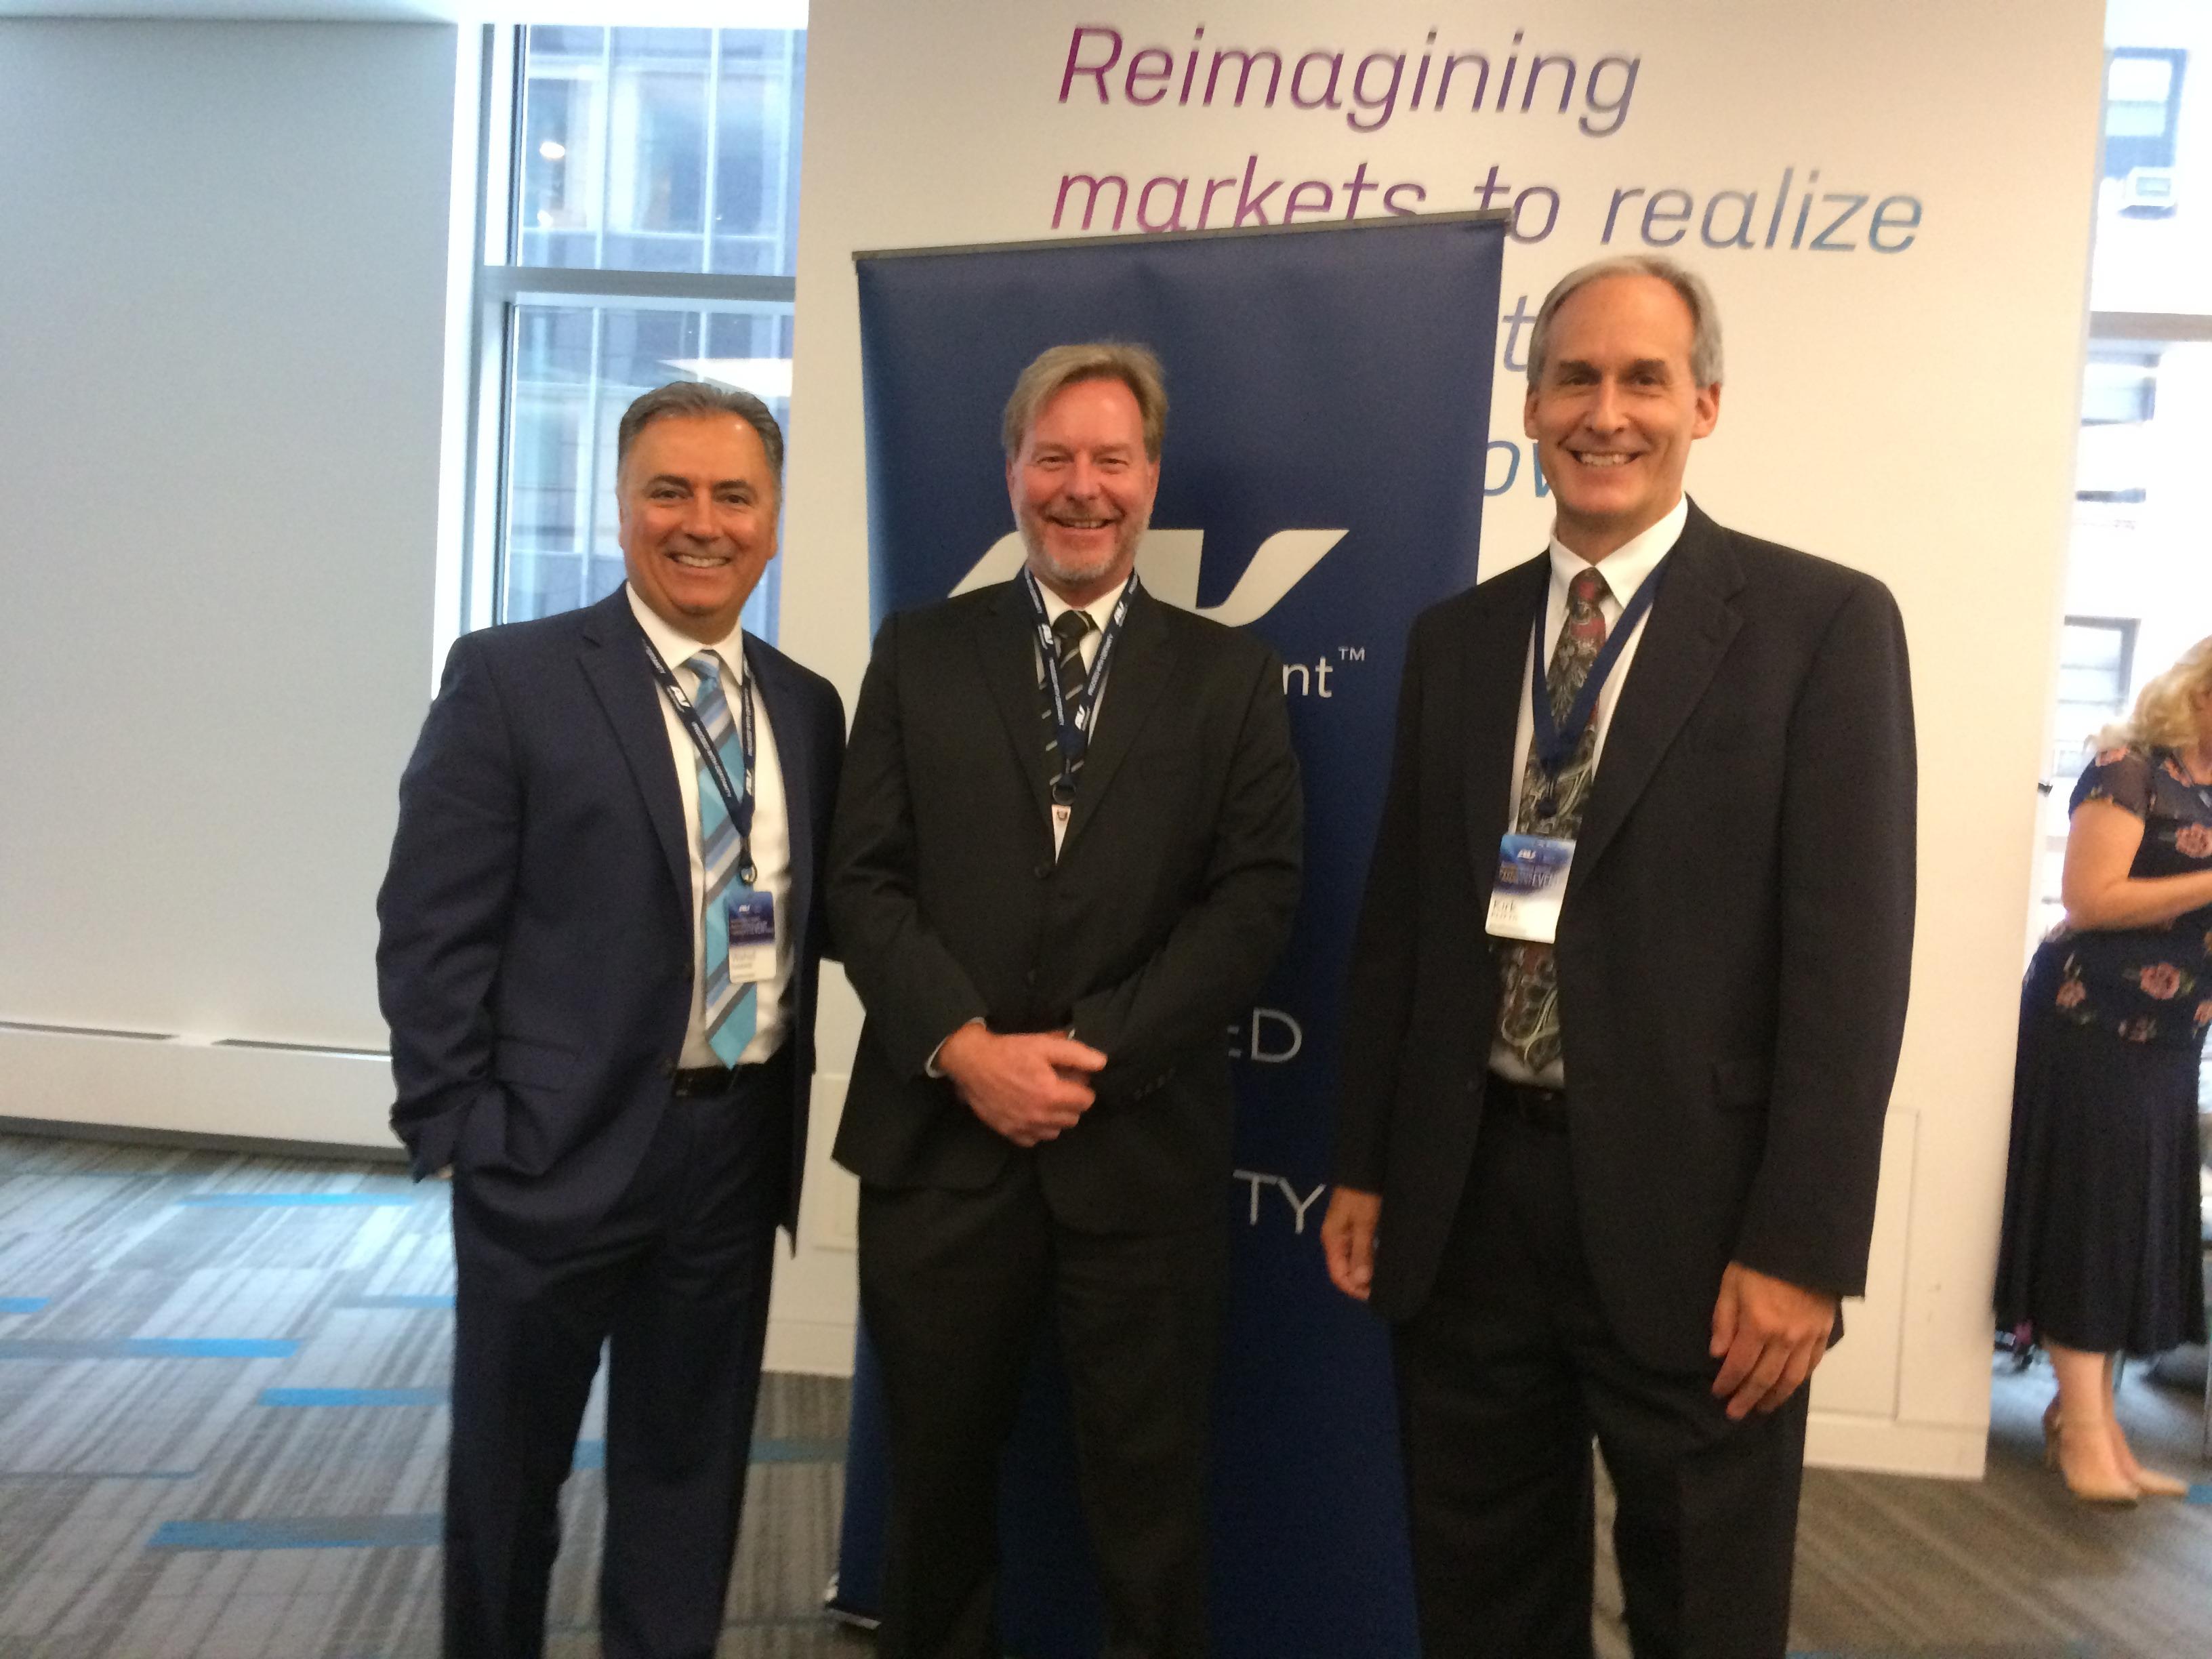 Wahid Nawabi (presidente da AeroVironment), Ulf Bogdawa (SkyDrones/SkyAgri) e Kirk J. Flittie (AeroVironment)